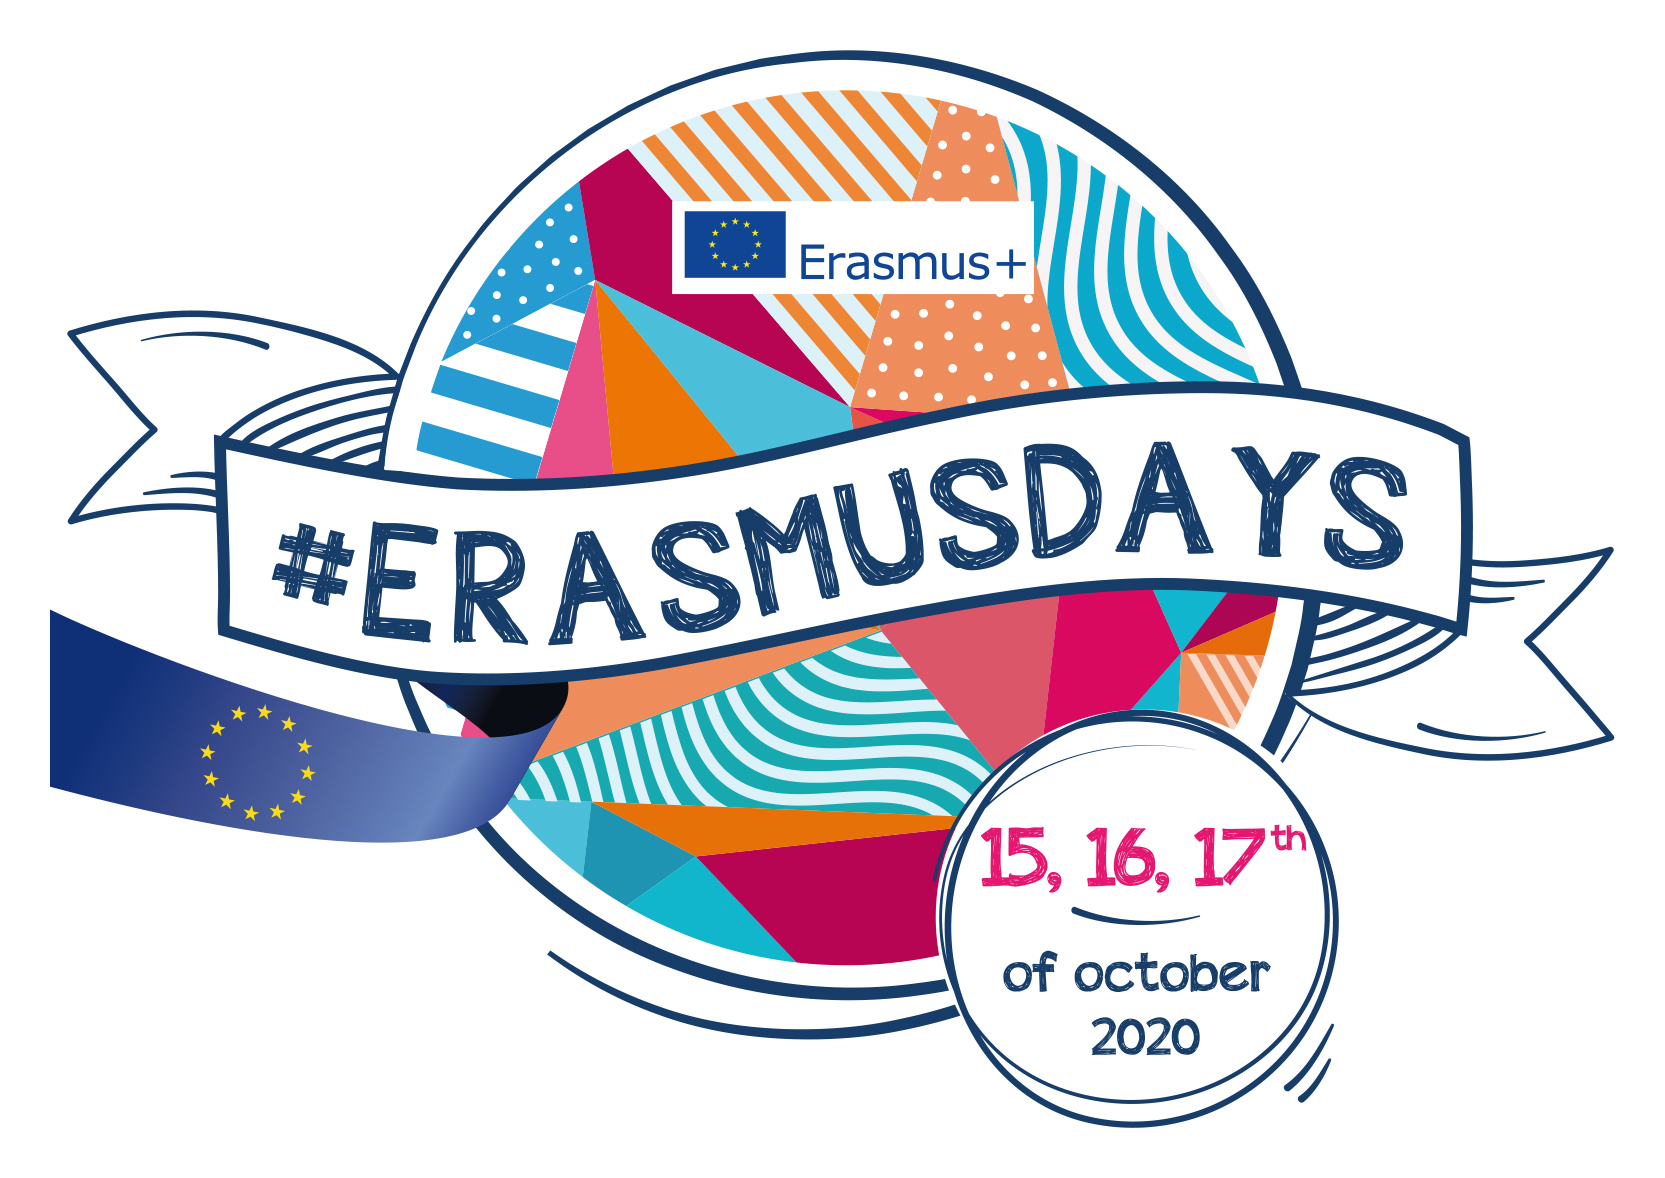 #ErasmusDays #ErasmusUA